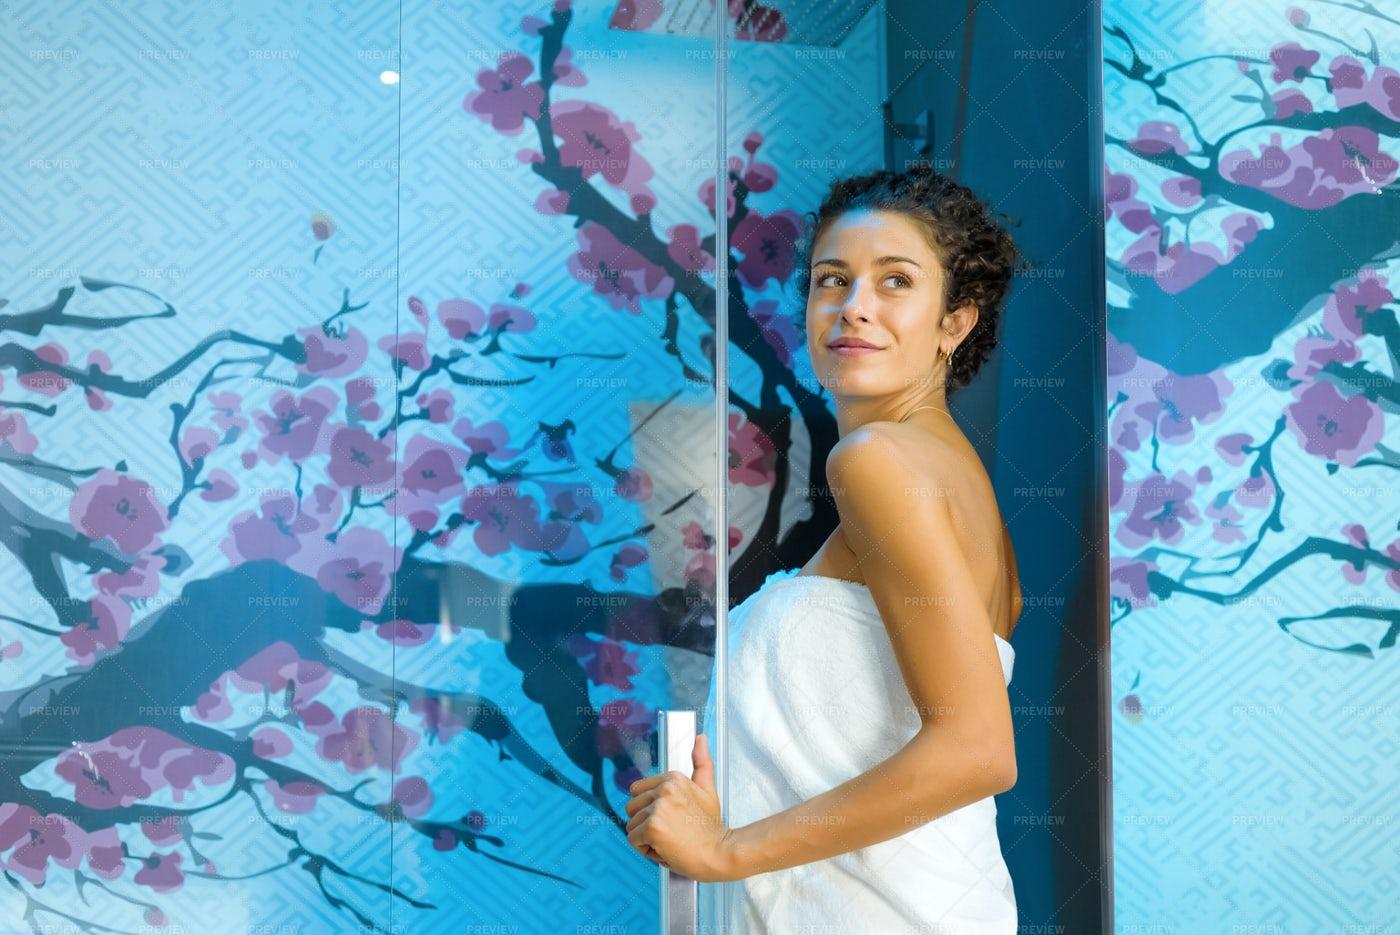 Blue Shower Cubicle: Stock Photos